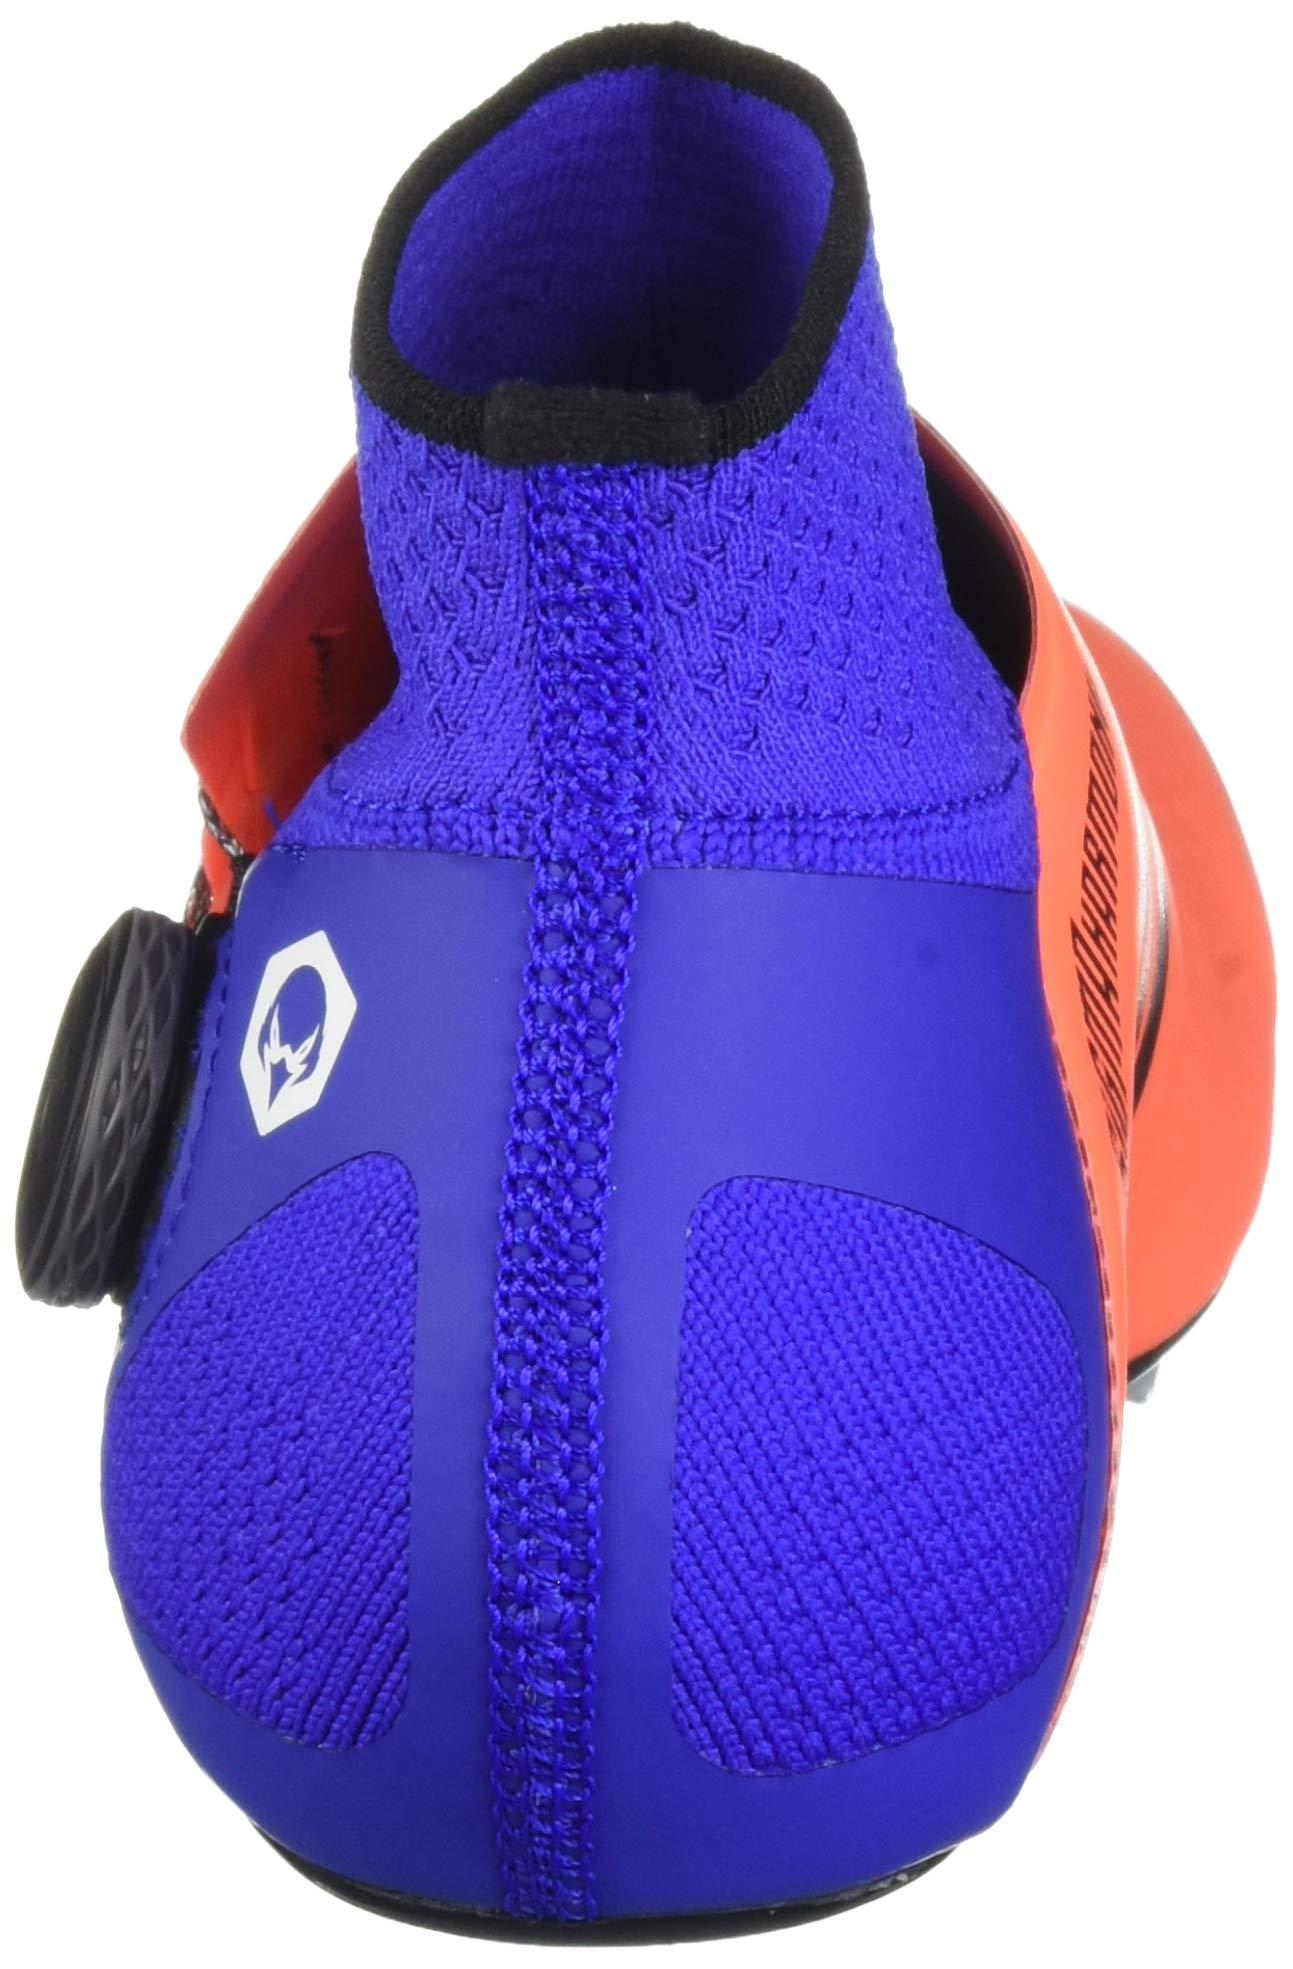 New Balance Men's Sigma Harmony Vazee Track Shoe Dark Mango/uv Blue 5 D US by New Balance (Image #2)